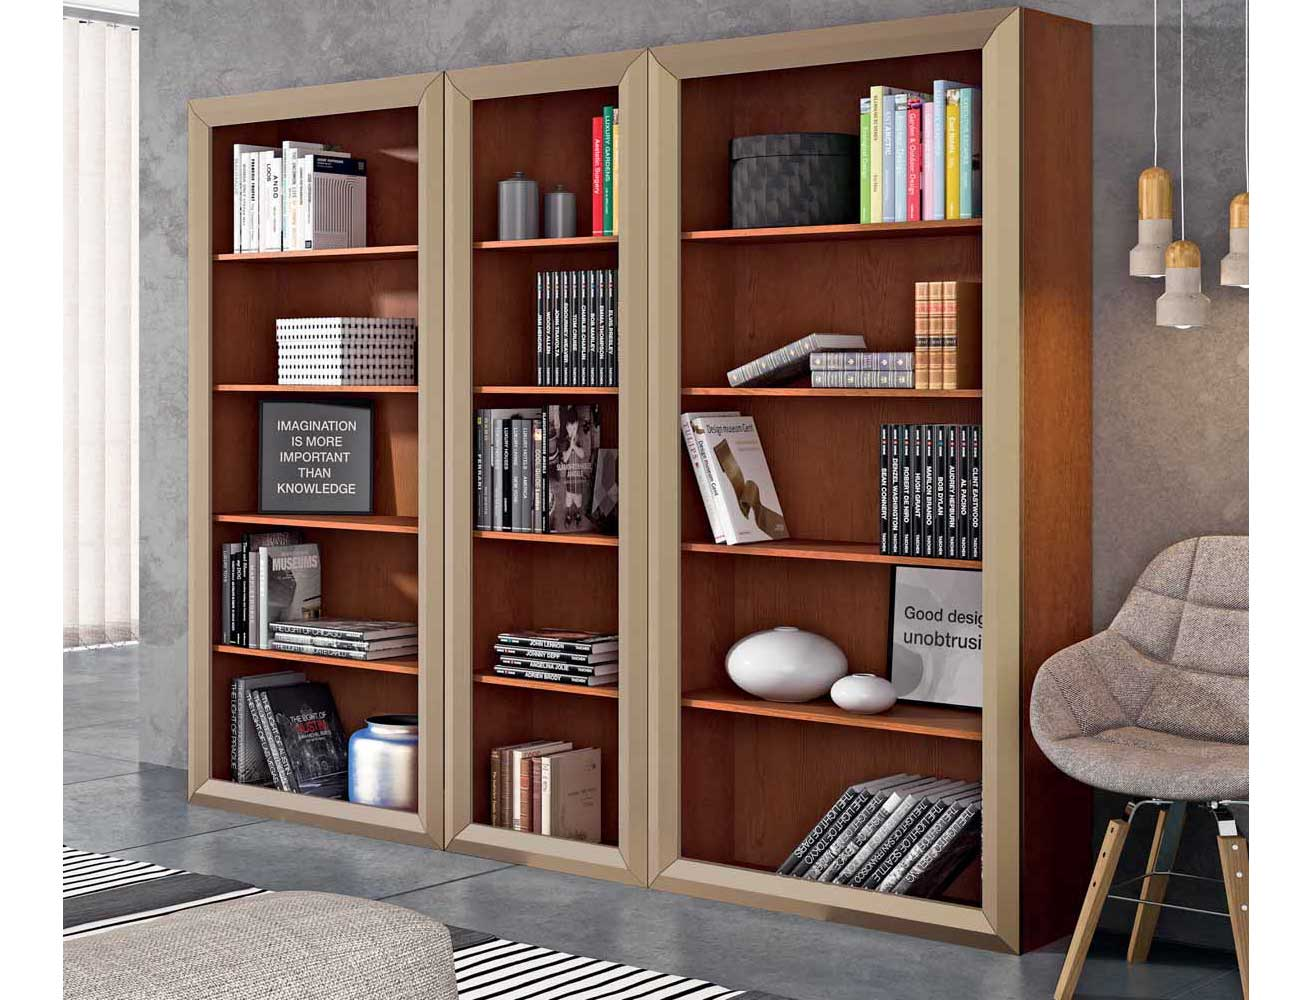 Torre libreria estanteria salon comedor mueble1